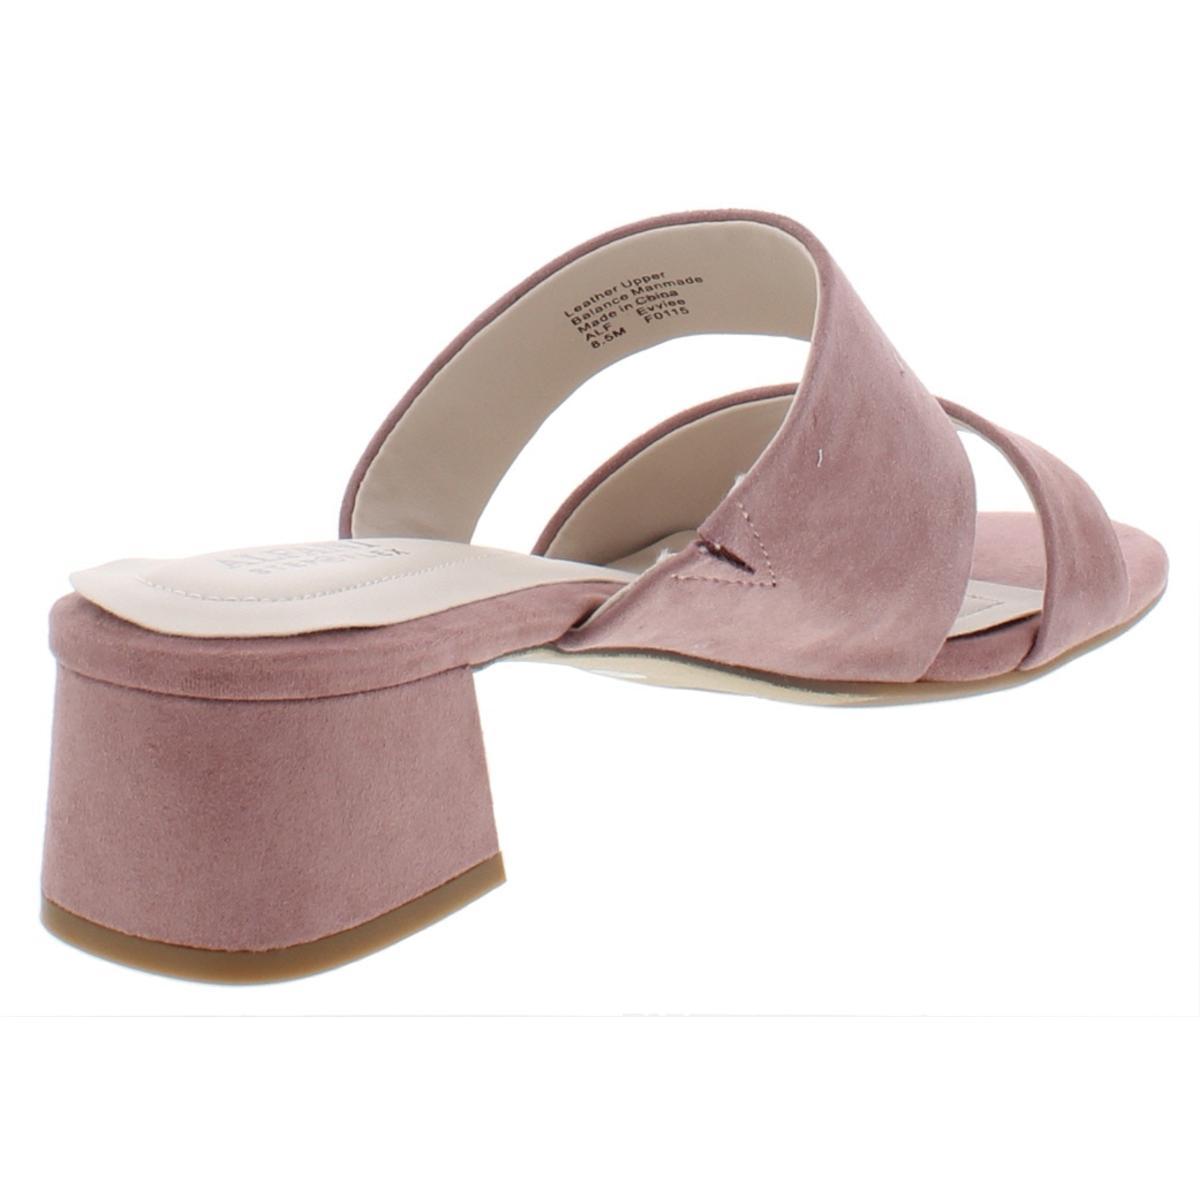 Alfani-Womens-Evviee-Faux-Leather-Block-Heel-Dress-Slide-Sandals-Shoes-BHFO-6323 thumbnail 6